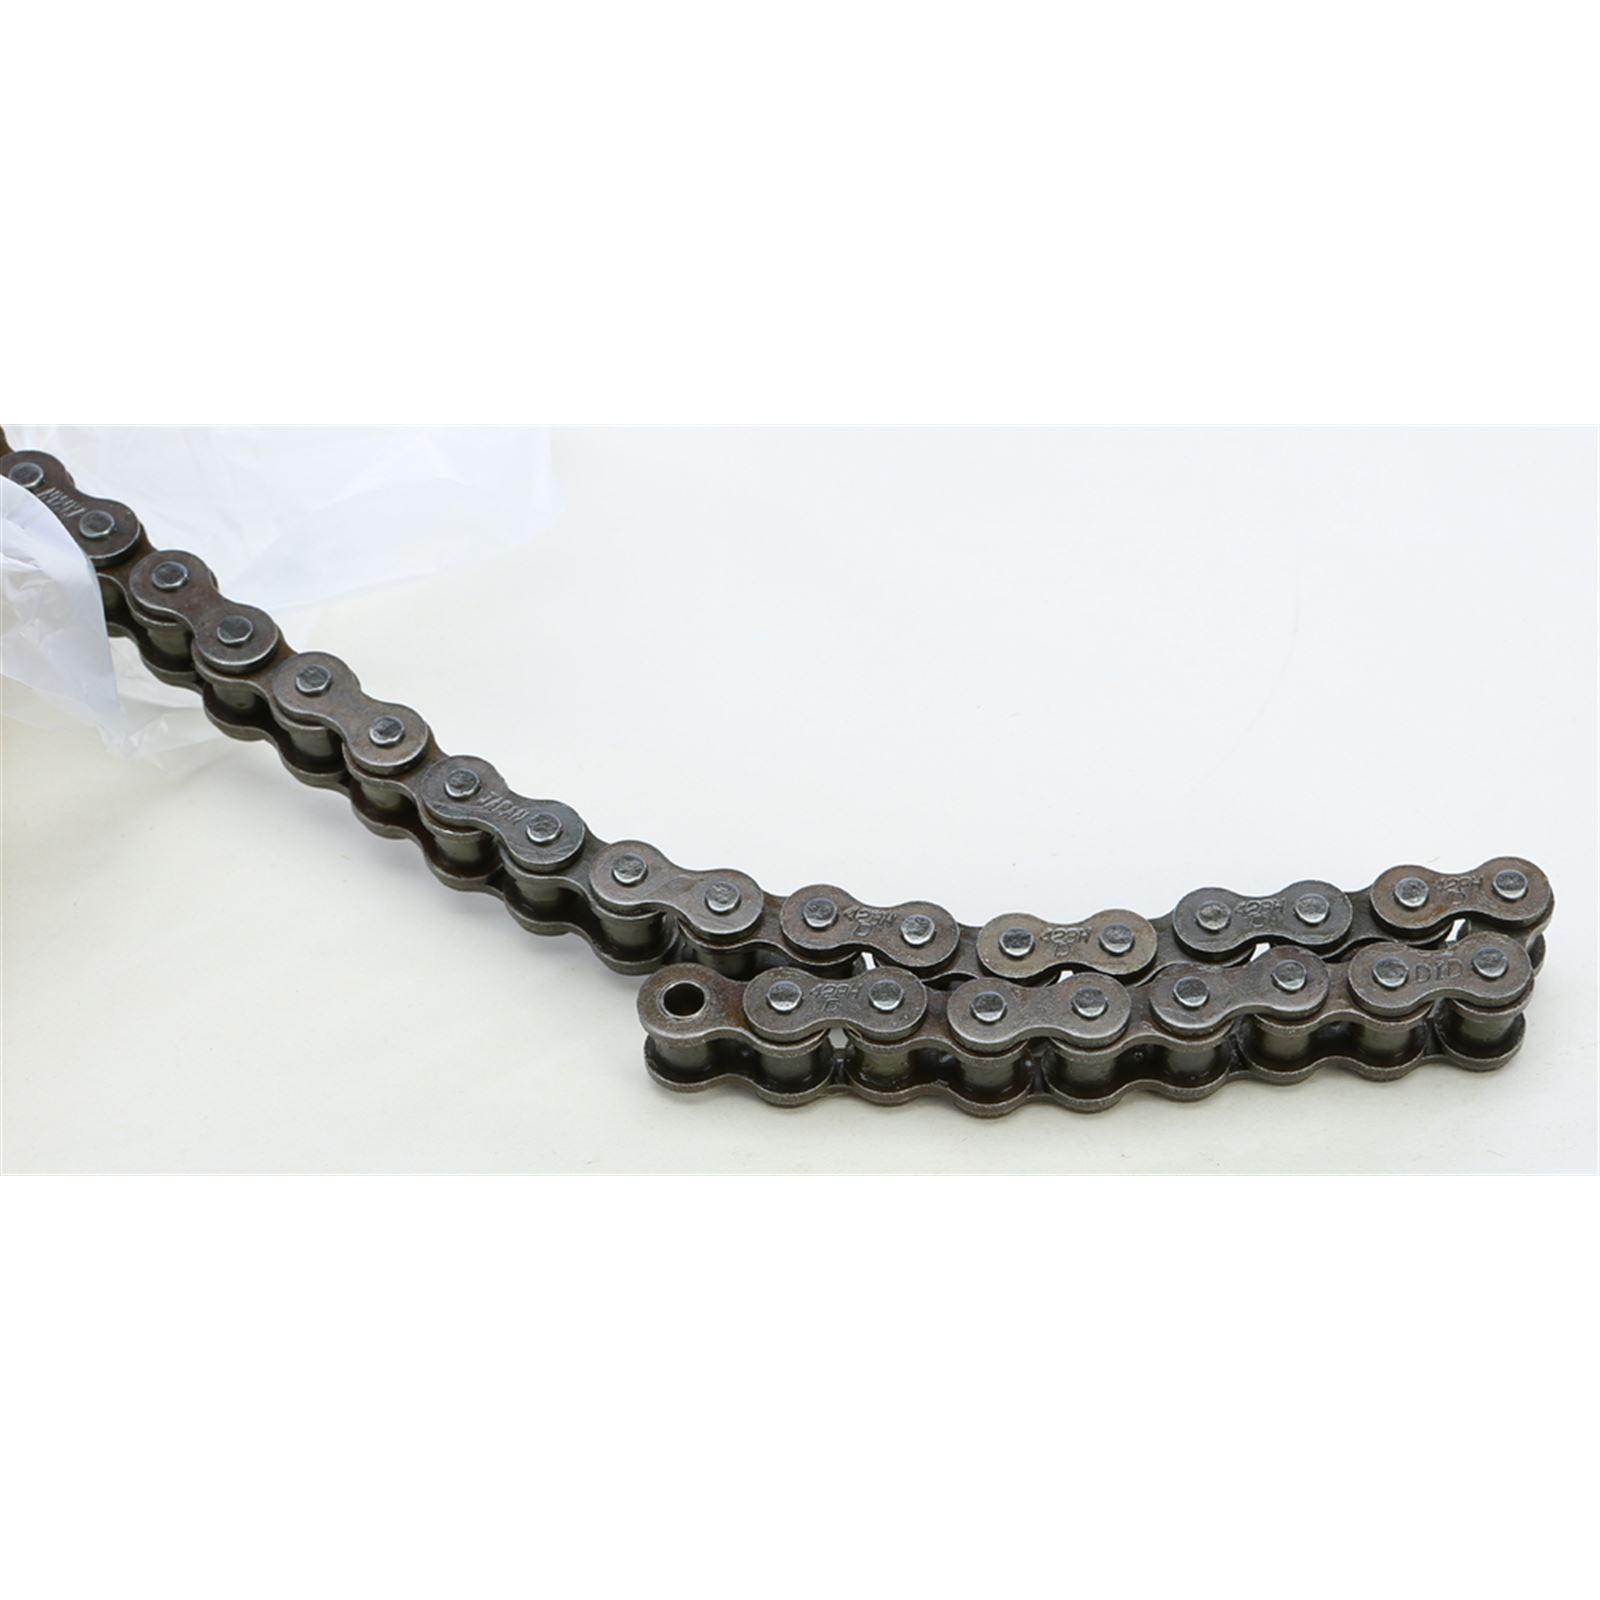 D.I.D Standard Series Chain